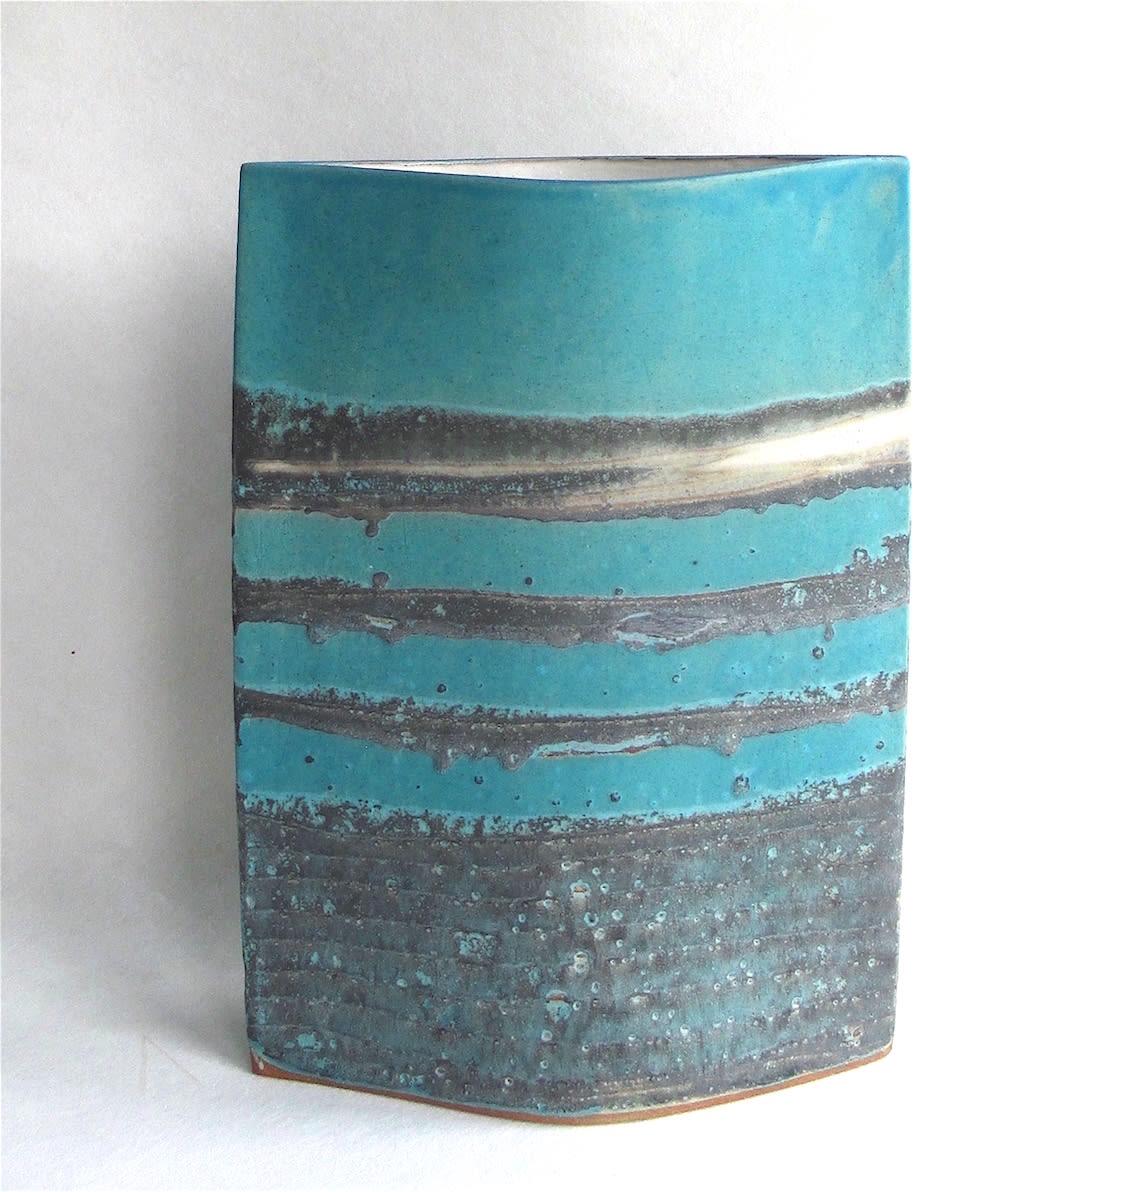 "<span class=""link fancybox-details-link""><a href=""/artists/44-sarah-perry/works/7441-sarah-perry-blue-water-ellipse-2020/"">View Detail Page</a></span><div class=""artist""><strong>Sarah Perry</strong></div> b. 1945 <div class=""title""><em>Blue Water Ellipse</em>, 2020</div> <div class=""medium"">Stoneware<br /> Impressed with the artist's seal 'SP'</div> <div class=""dimensions"">h. 29.5 cm x w. 21 cm x d. 7.5 cm</div><div class=""price"">£315.00</div><div class=""copyright_line"">Own Art: £31.50 x 10 months, 0% APR</div>"